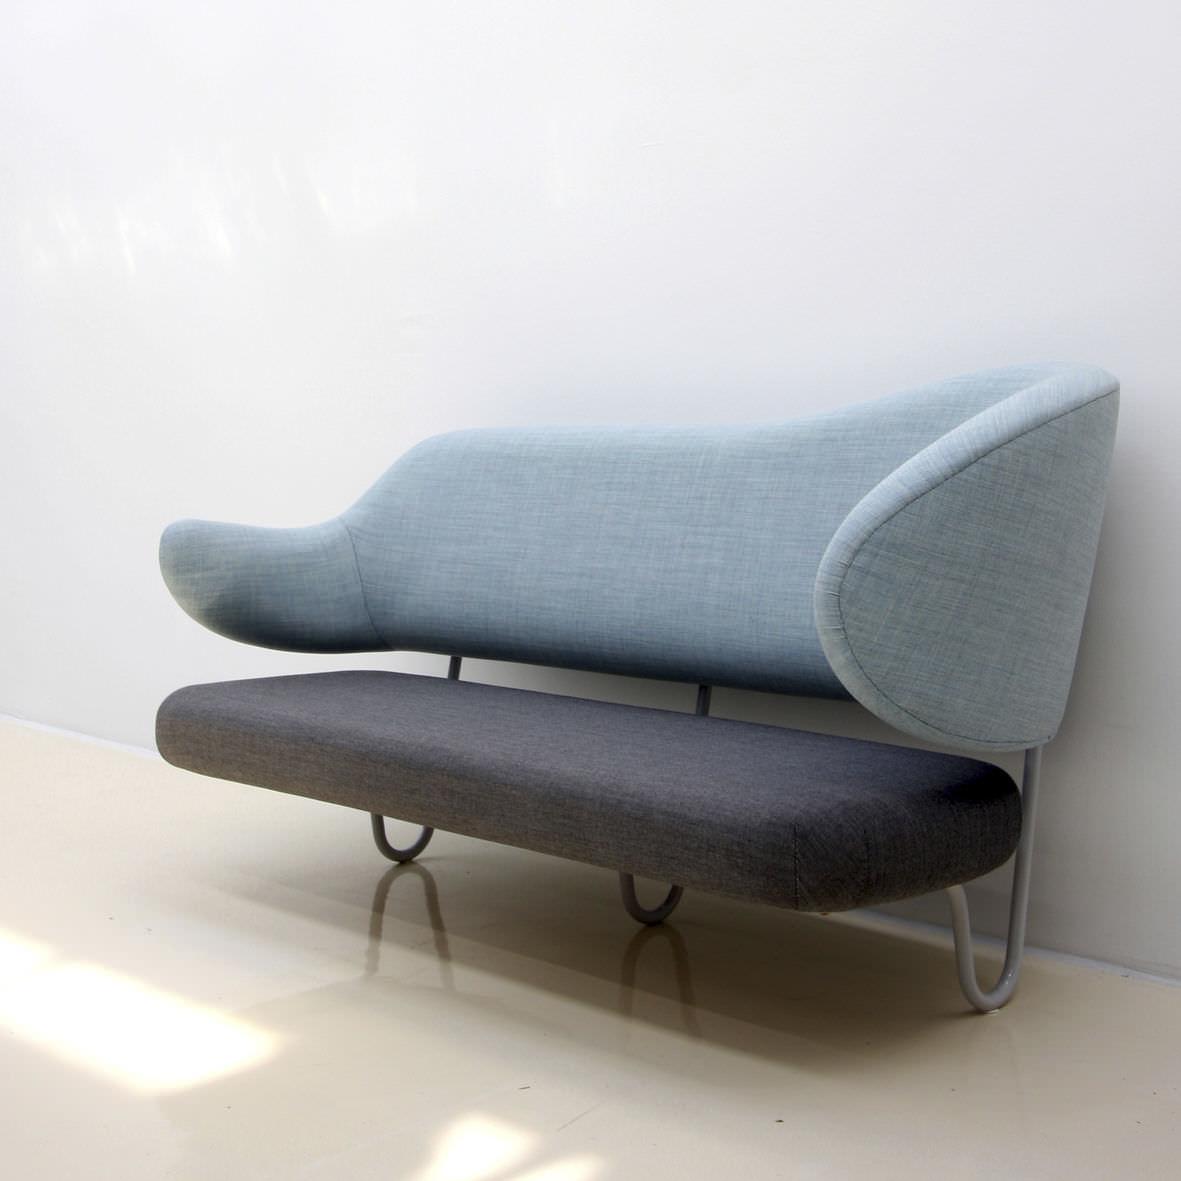 ... Scandinavian Design Sofa / Fabric / Lacquered Steel / By Finn Juhl ...